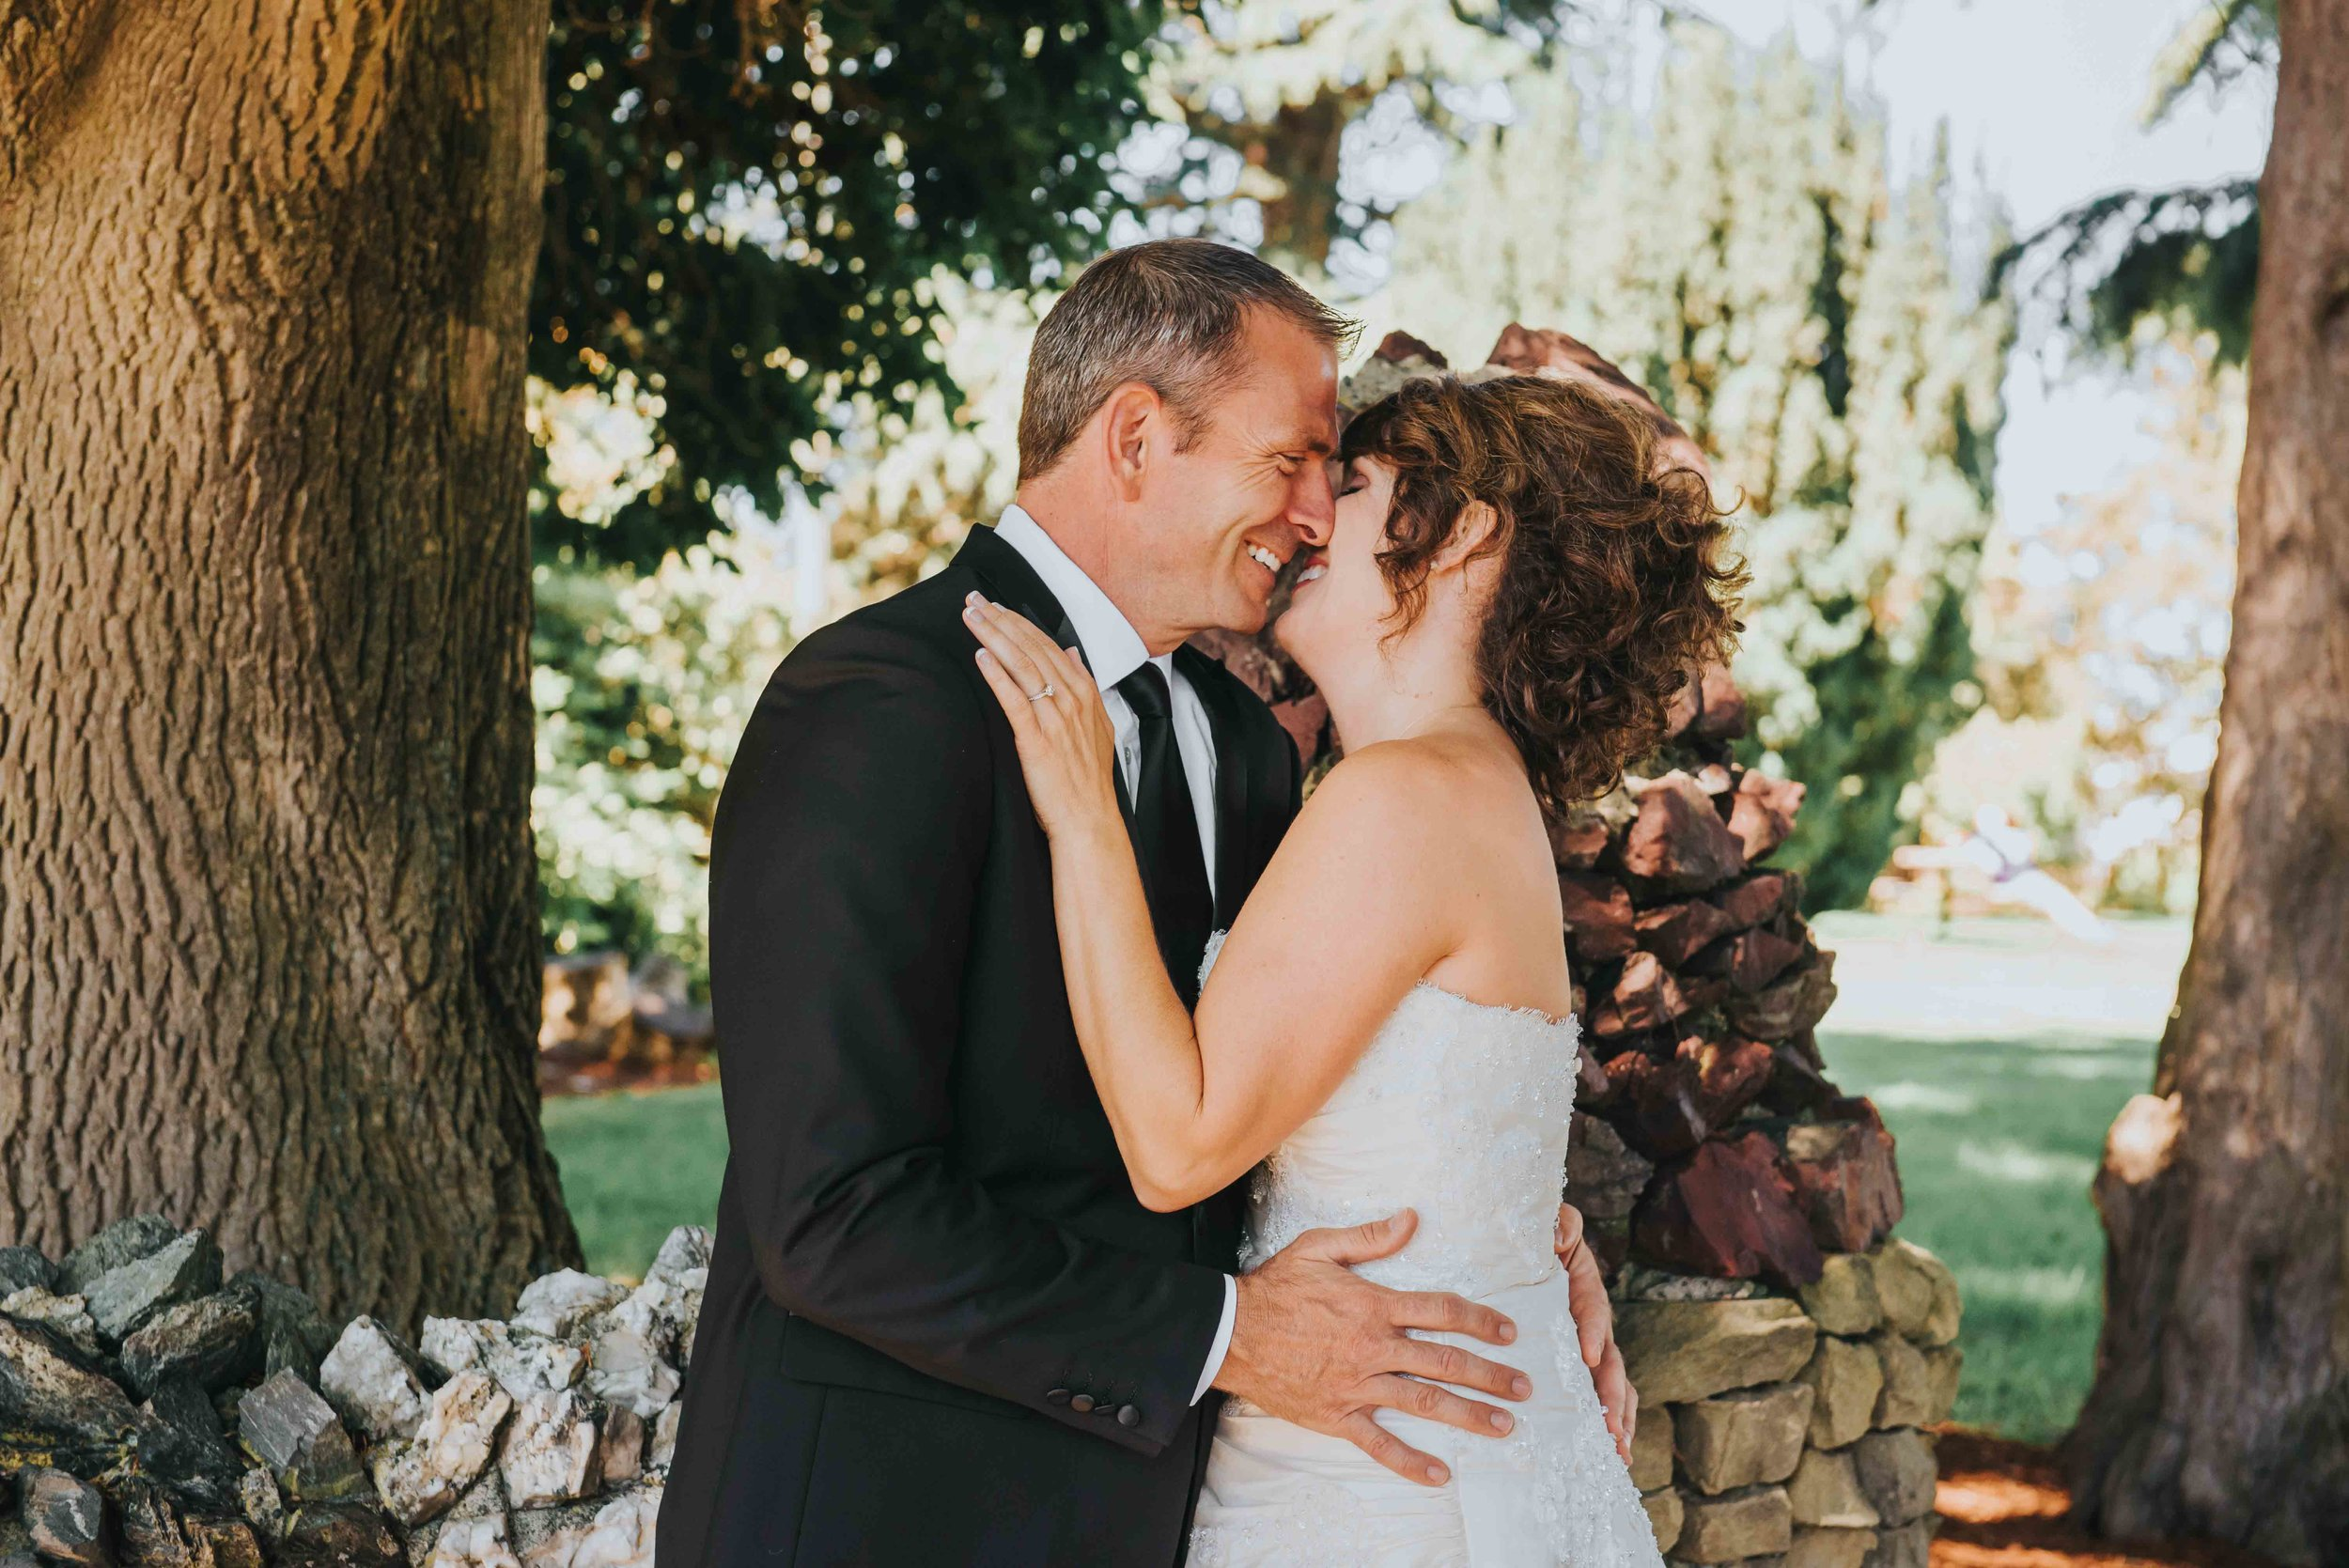 Cap-Sante-Wedding-J-Hodges-Anacortes-12.jpg